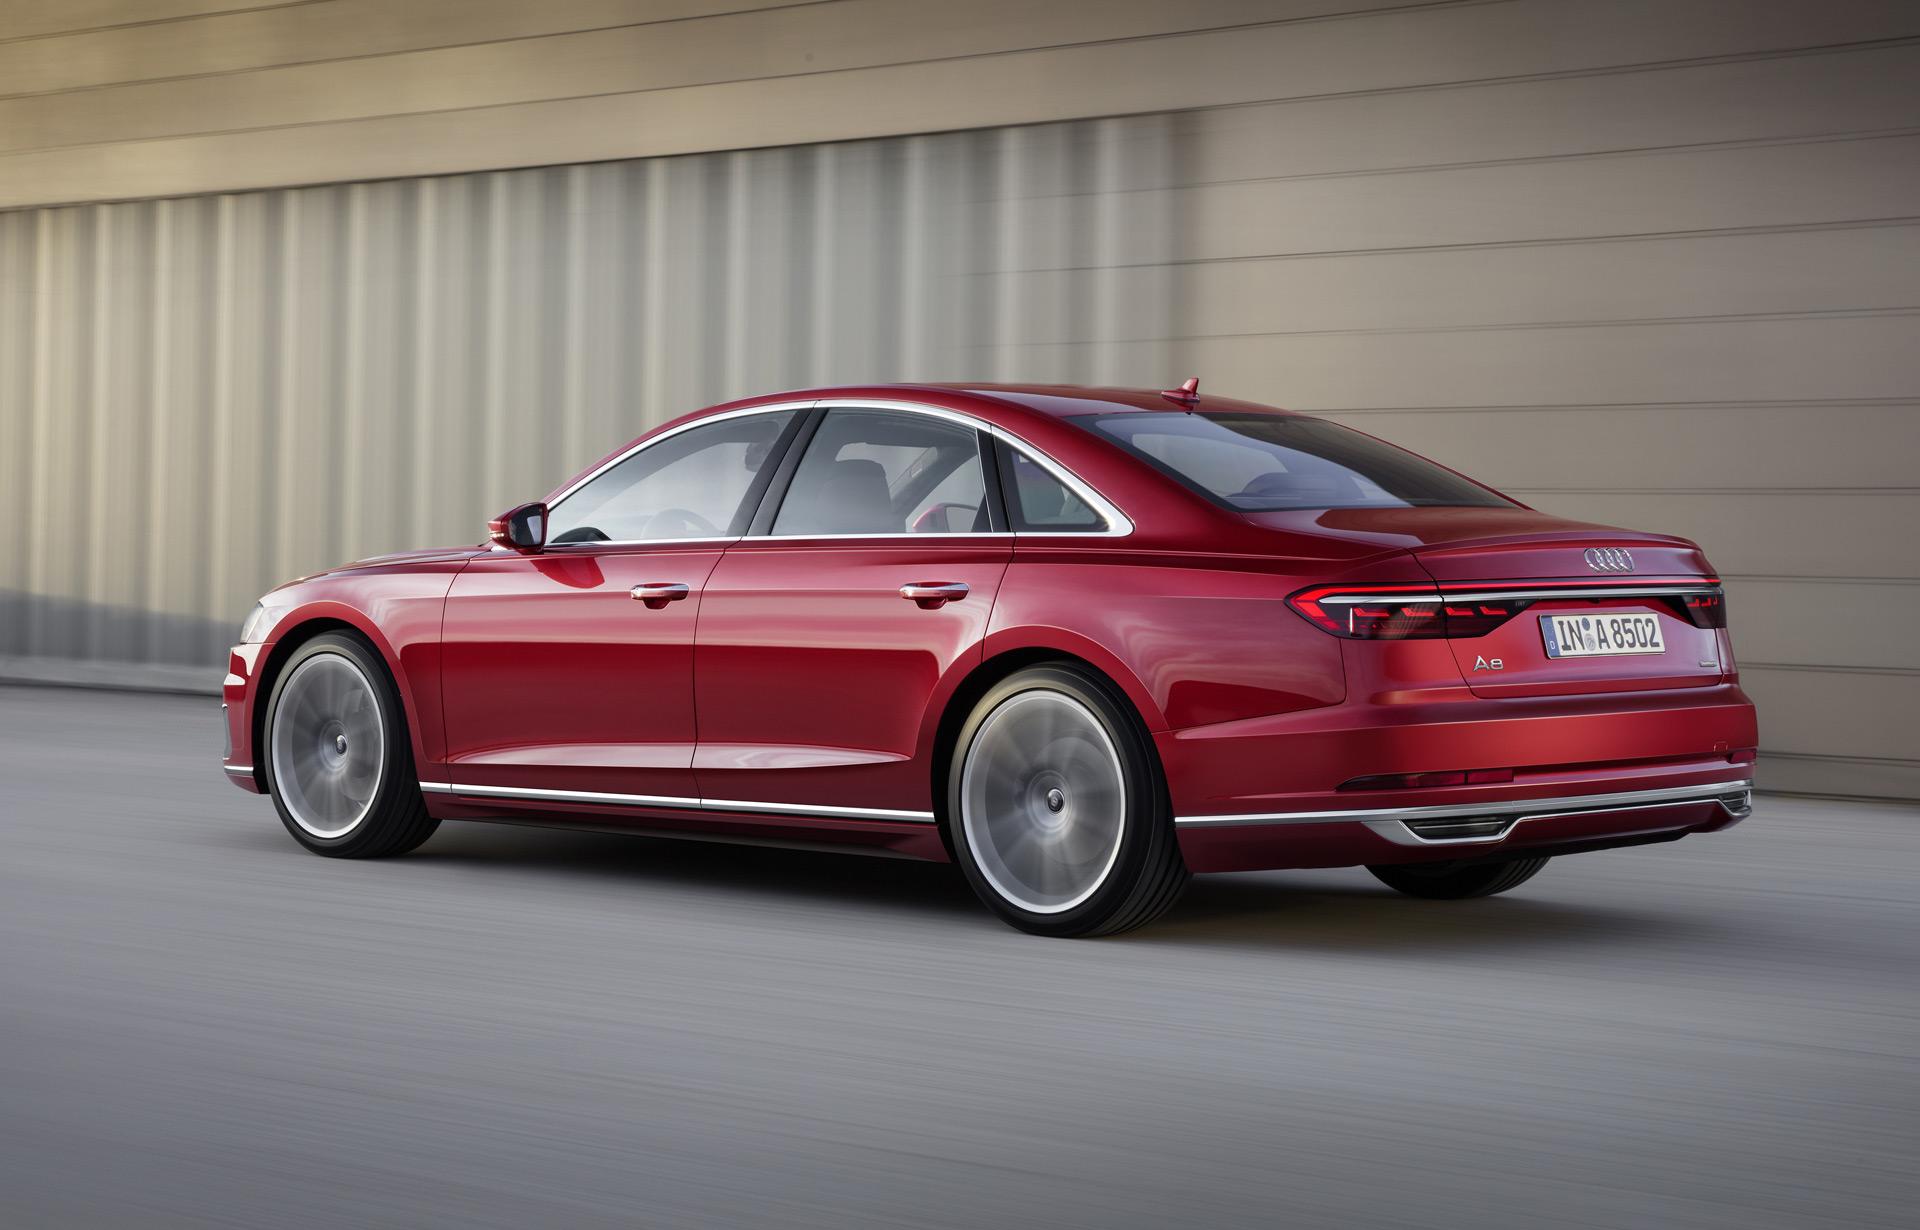 Land Rover Chicago >> Report: Next Audi S8 Plus to borrow Porsche Panamera Turbo S E-Hybrid's plug-in powertrain